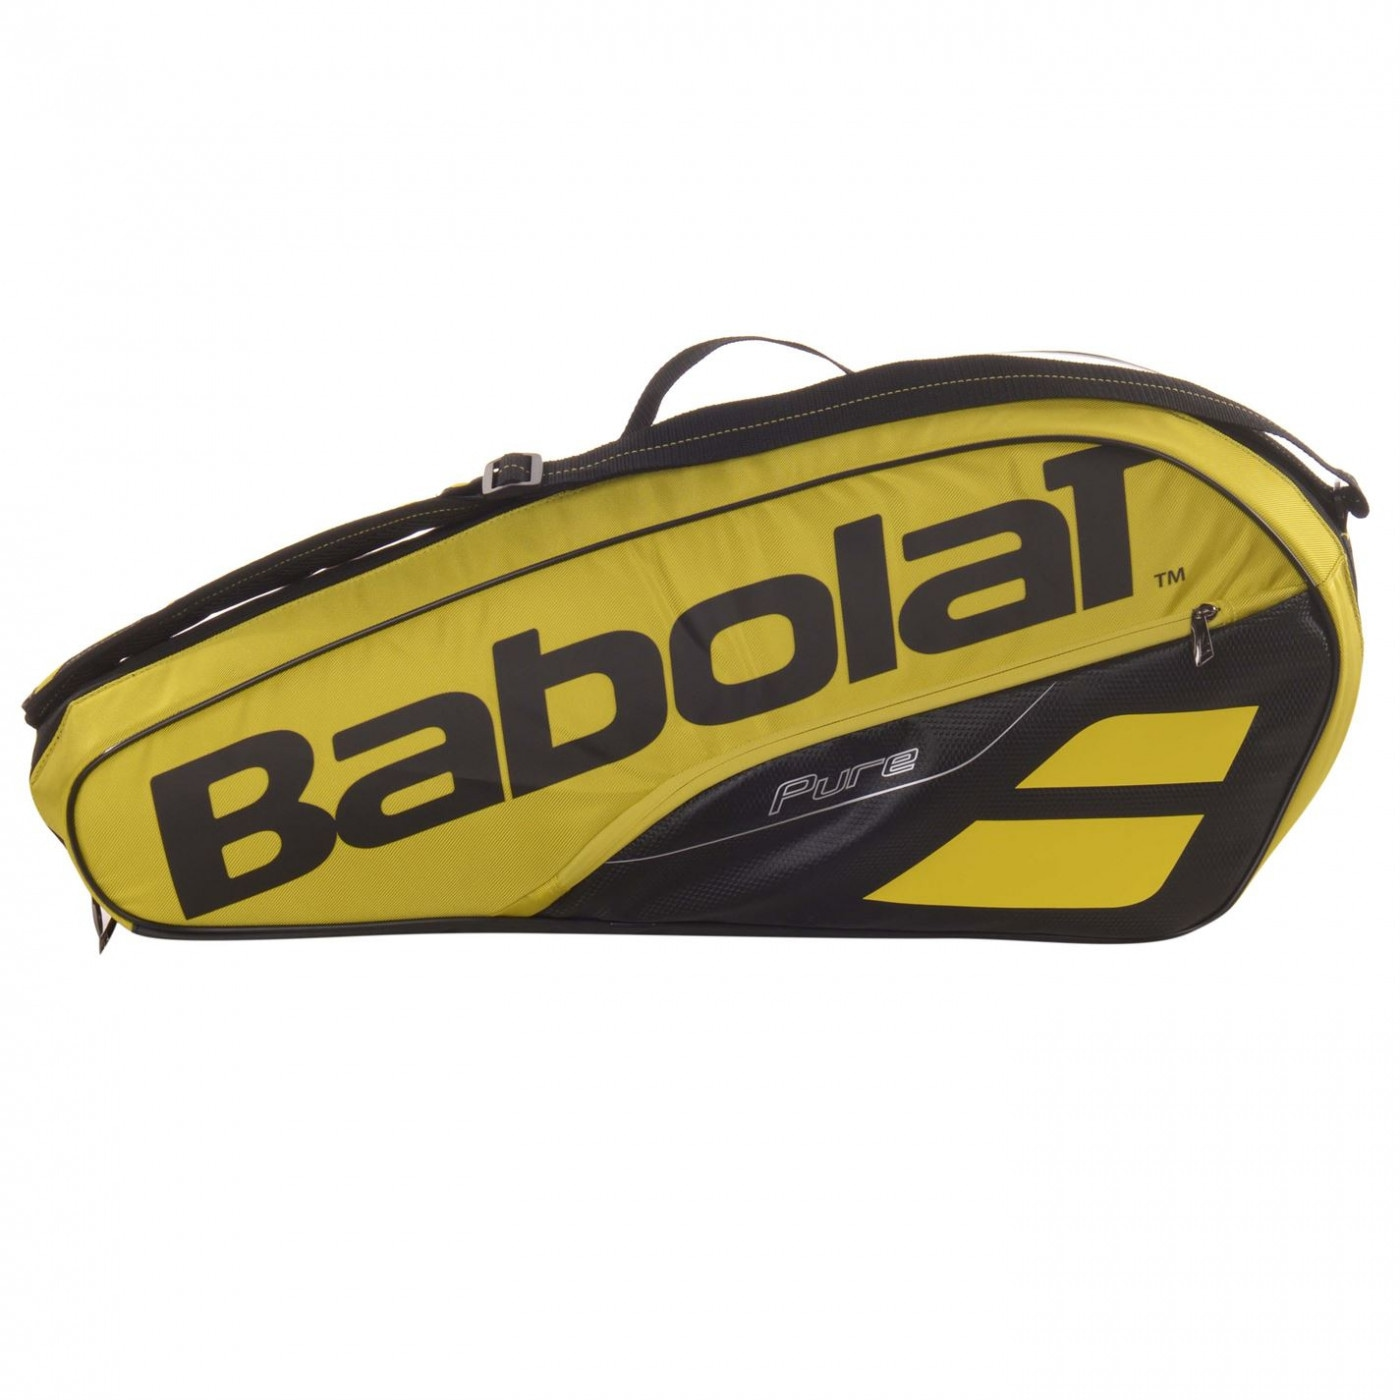 Babolat P Aero 3R Bag 04